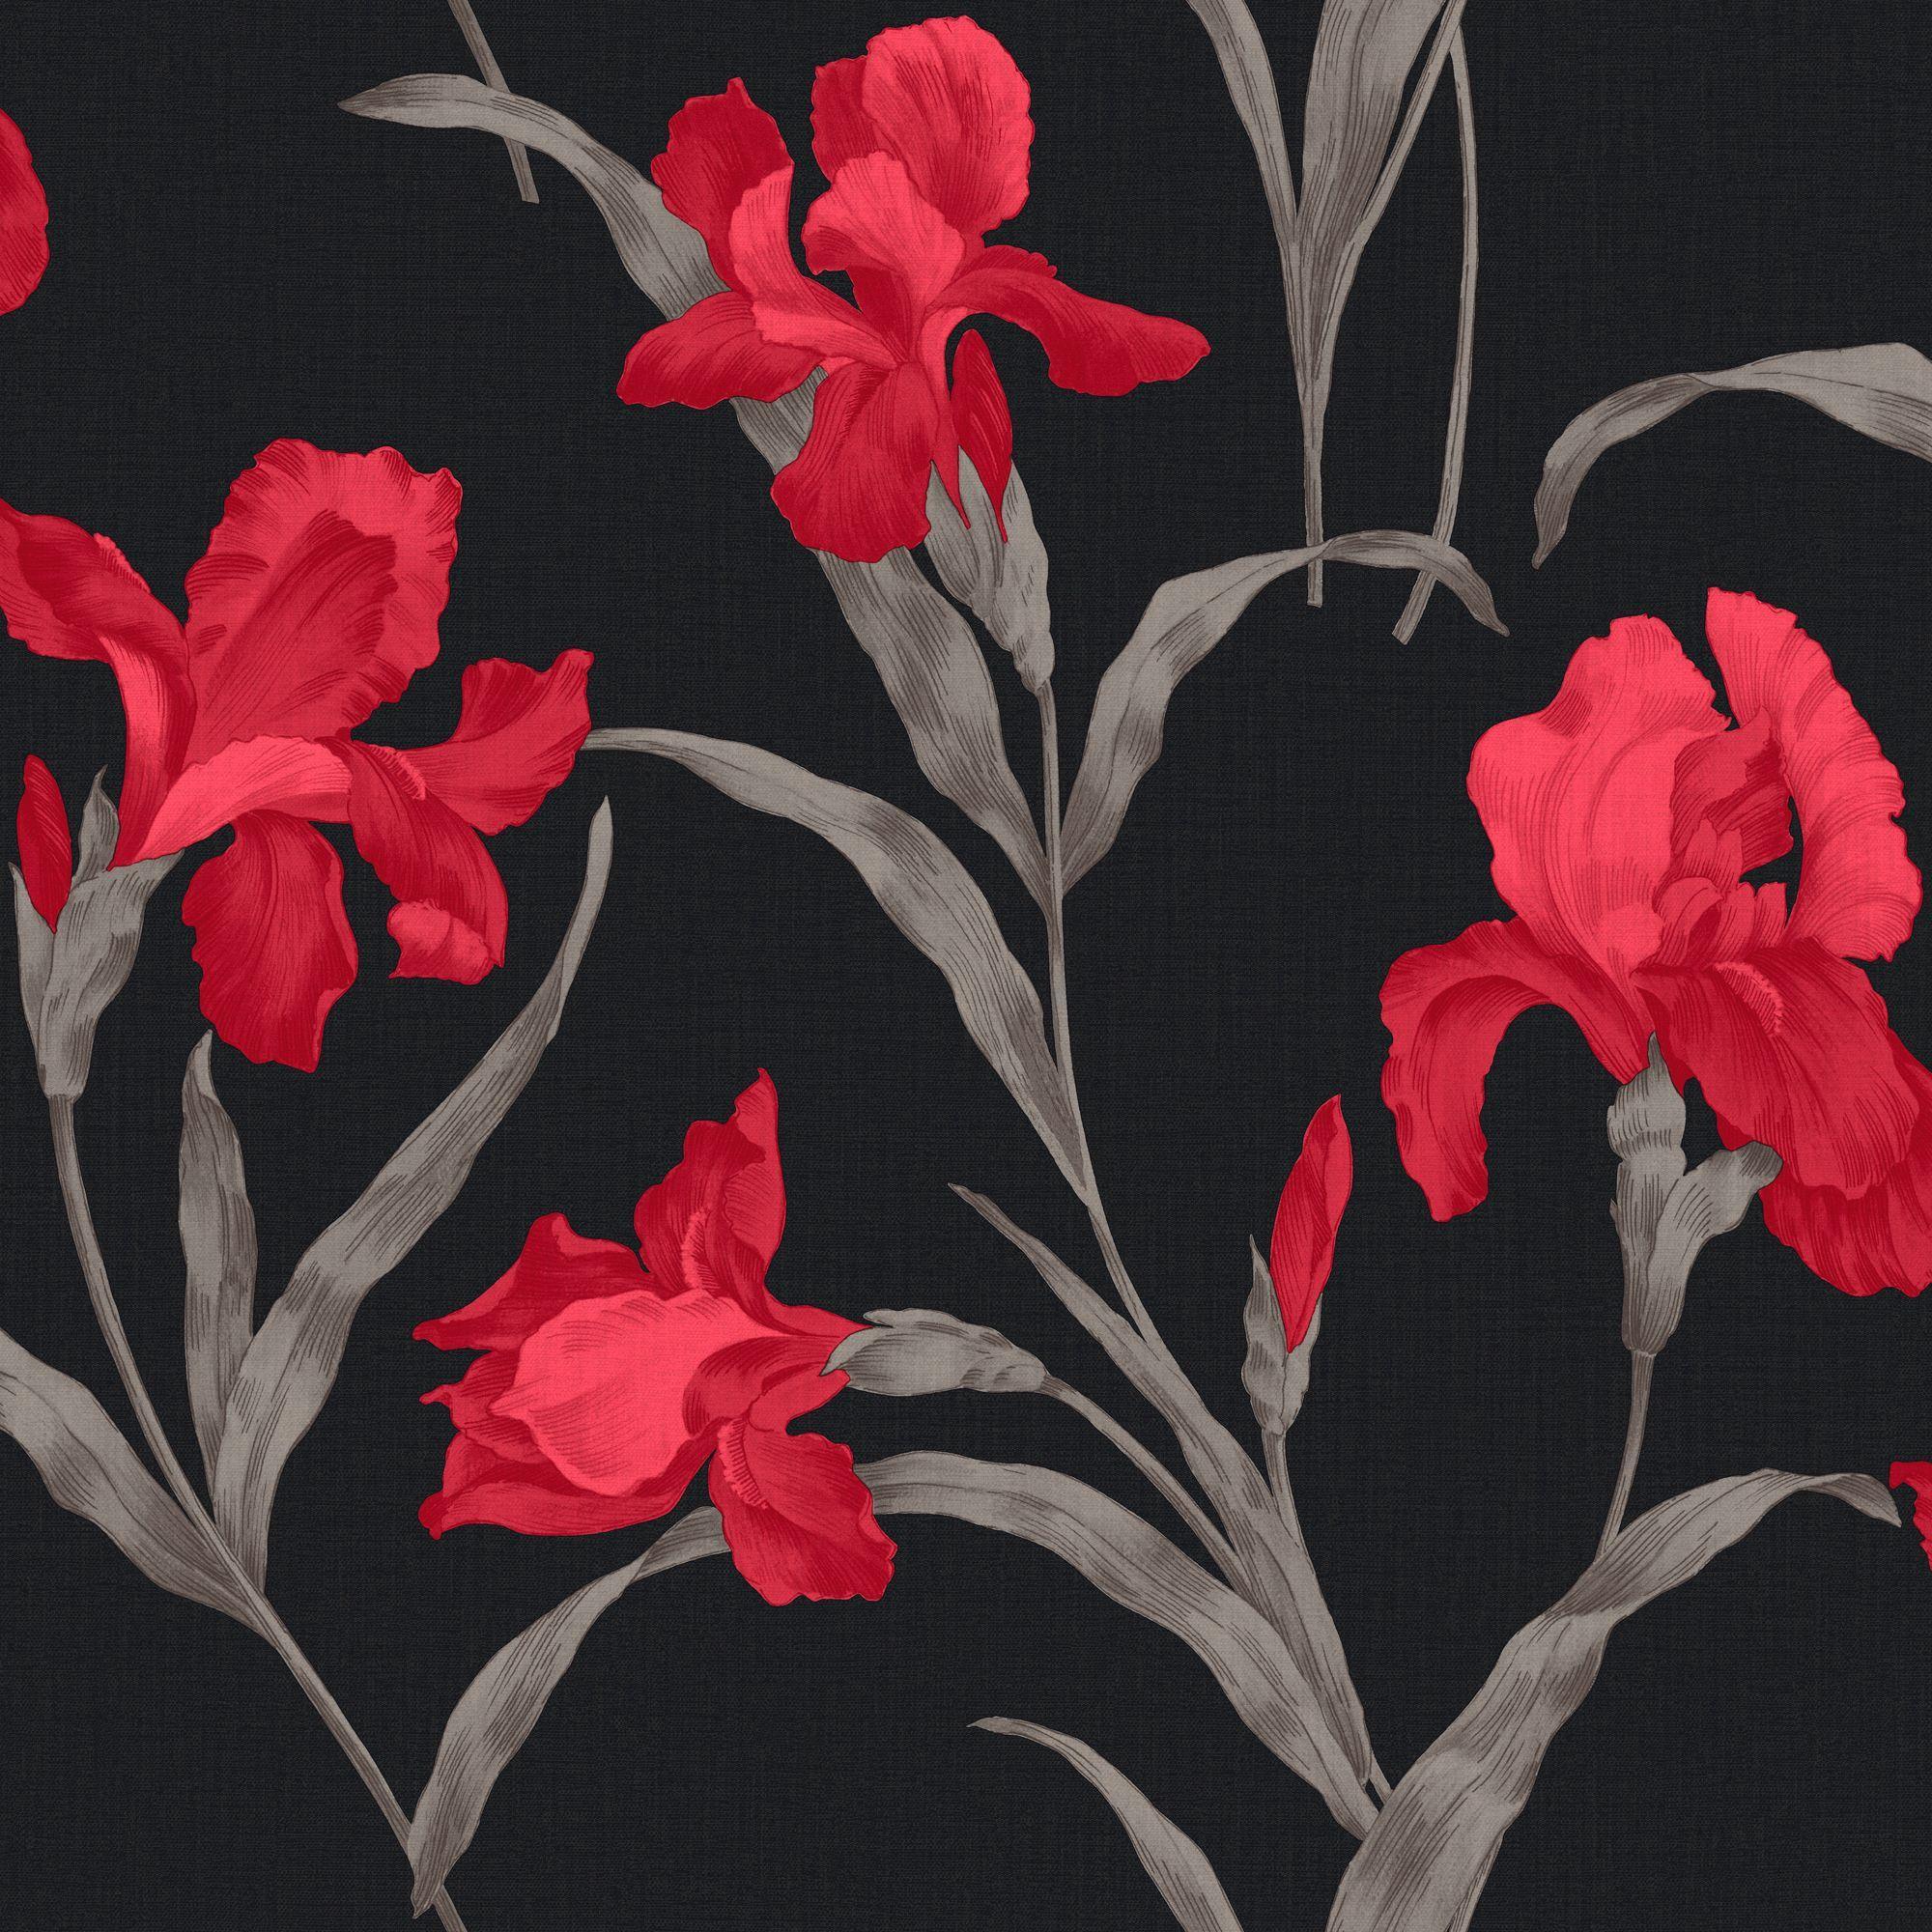 Red And Black Bedroom Wallpaper Arthouse Opera Tatami Black Red Wallpaper Decoraassalbo